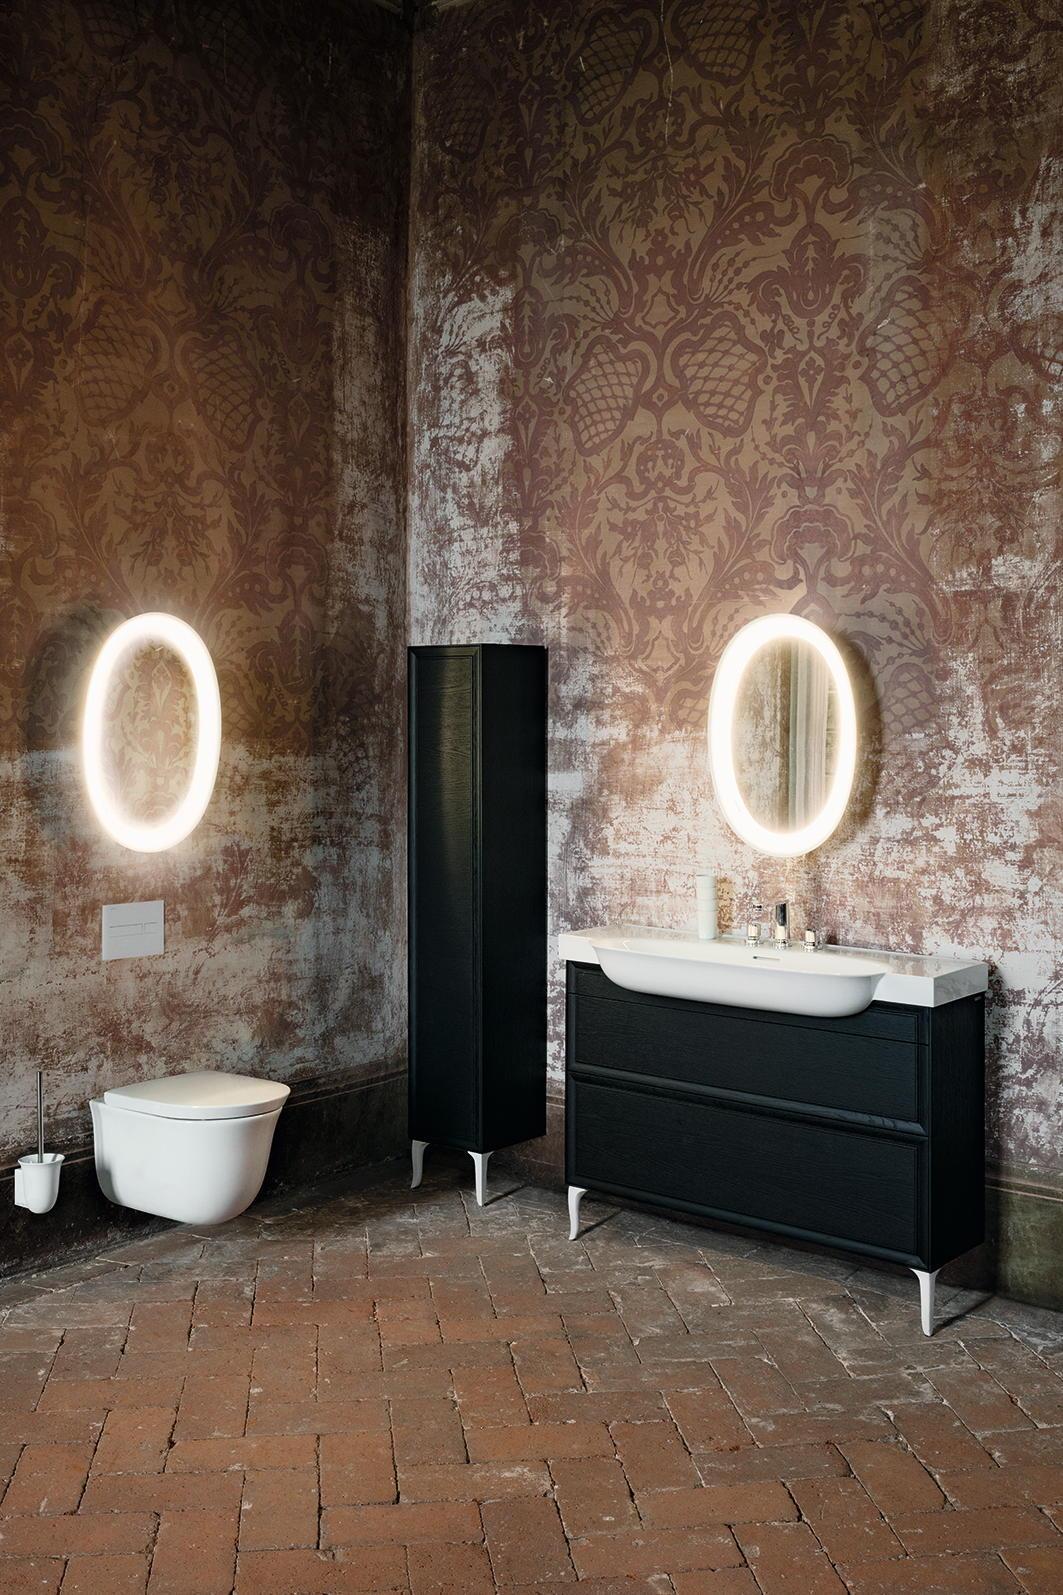 Saphirkeramik The New Classic Mirror By Laufen Stylepark